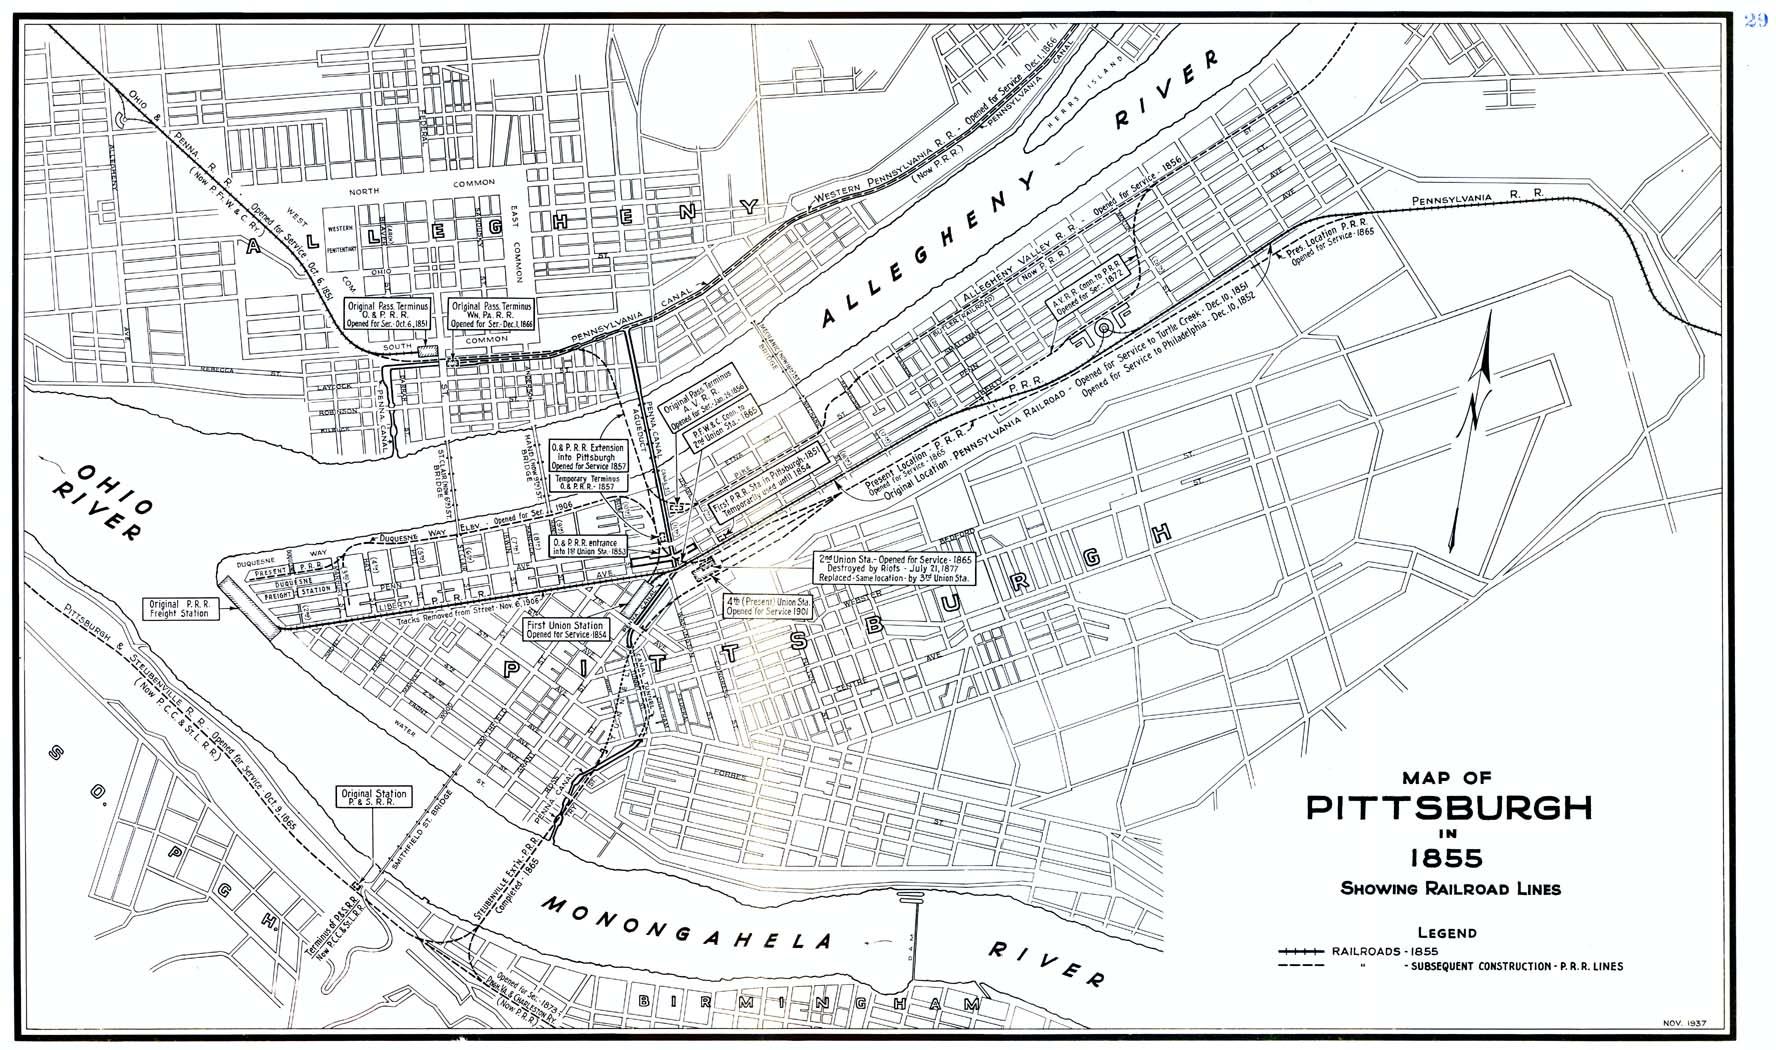 pittsburgh maps - pennsylvania railroad pittsburgh